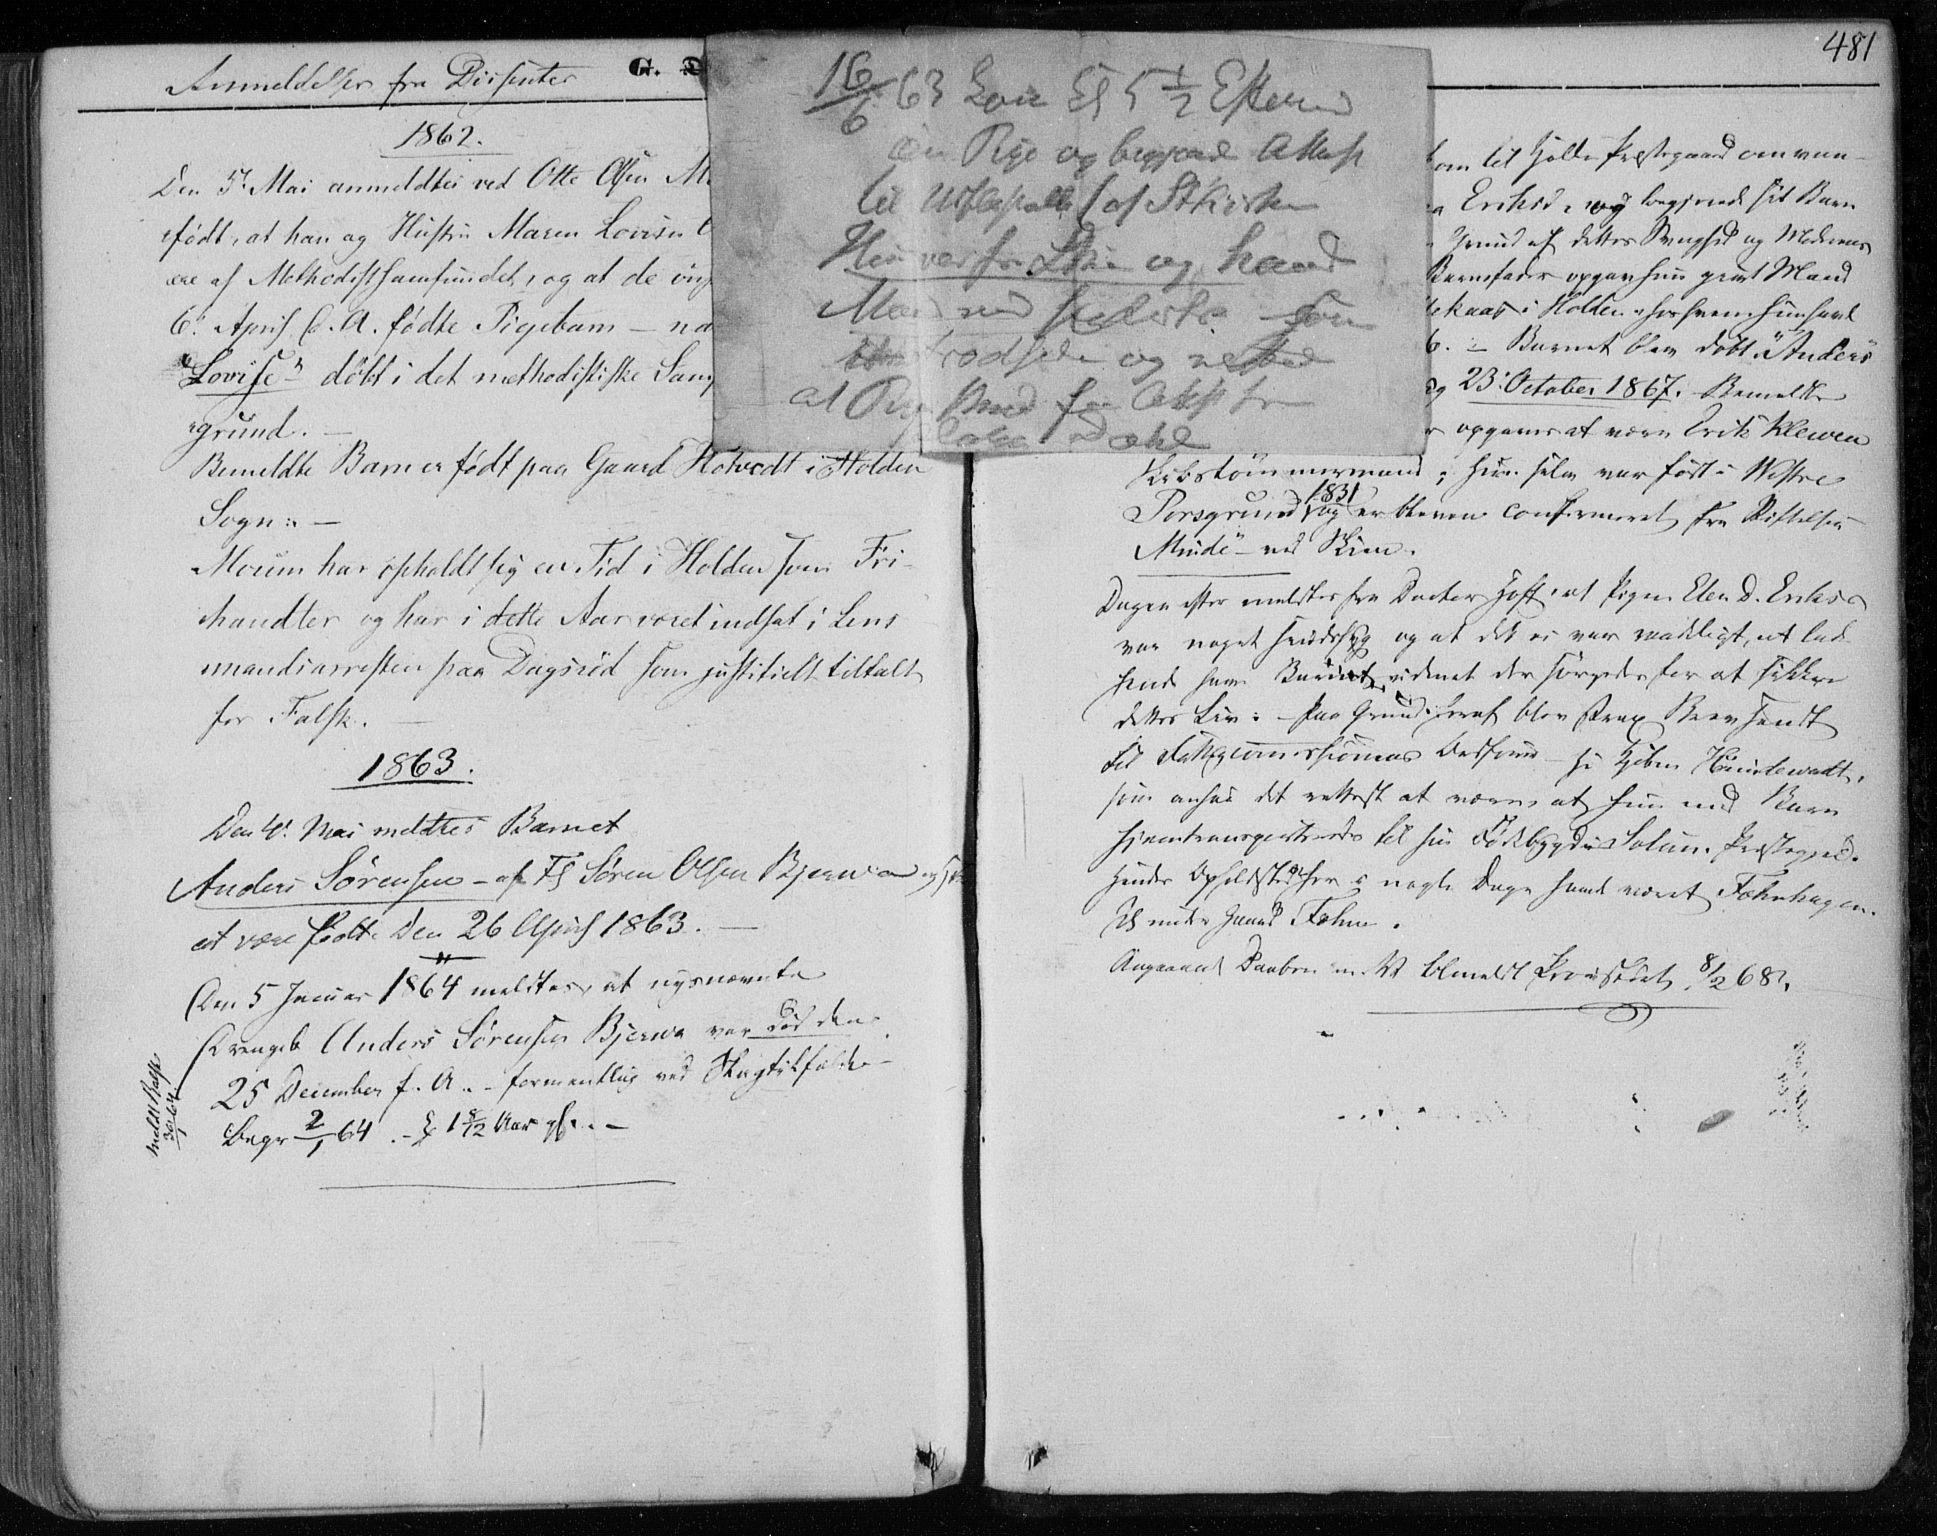 SAKO, Holla kirkebøker, F/Fa/L0005: Ministerialbok nr. 5, 1849-1860, s. 481